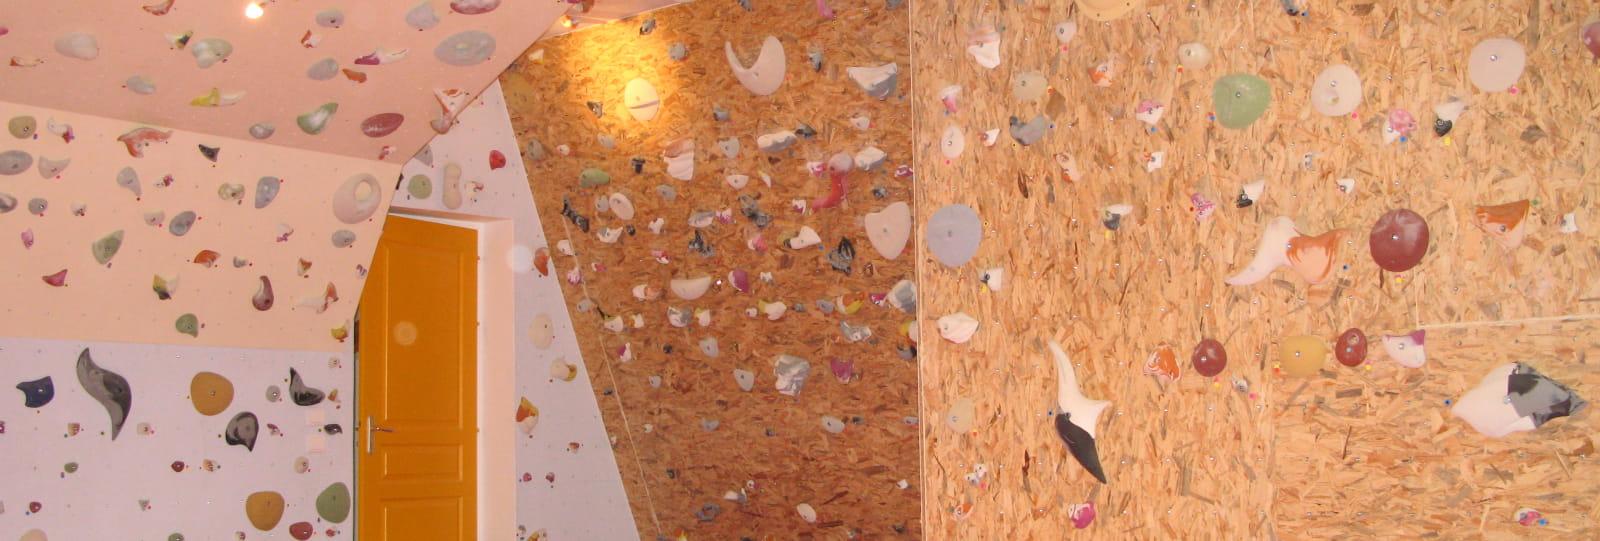 Structure artificielle d'escalade - Club alpin français